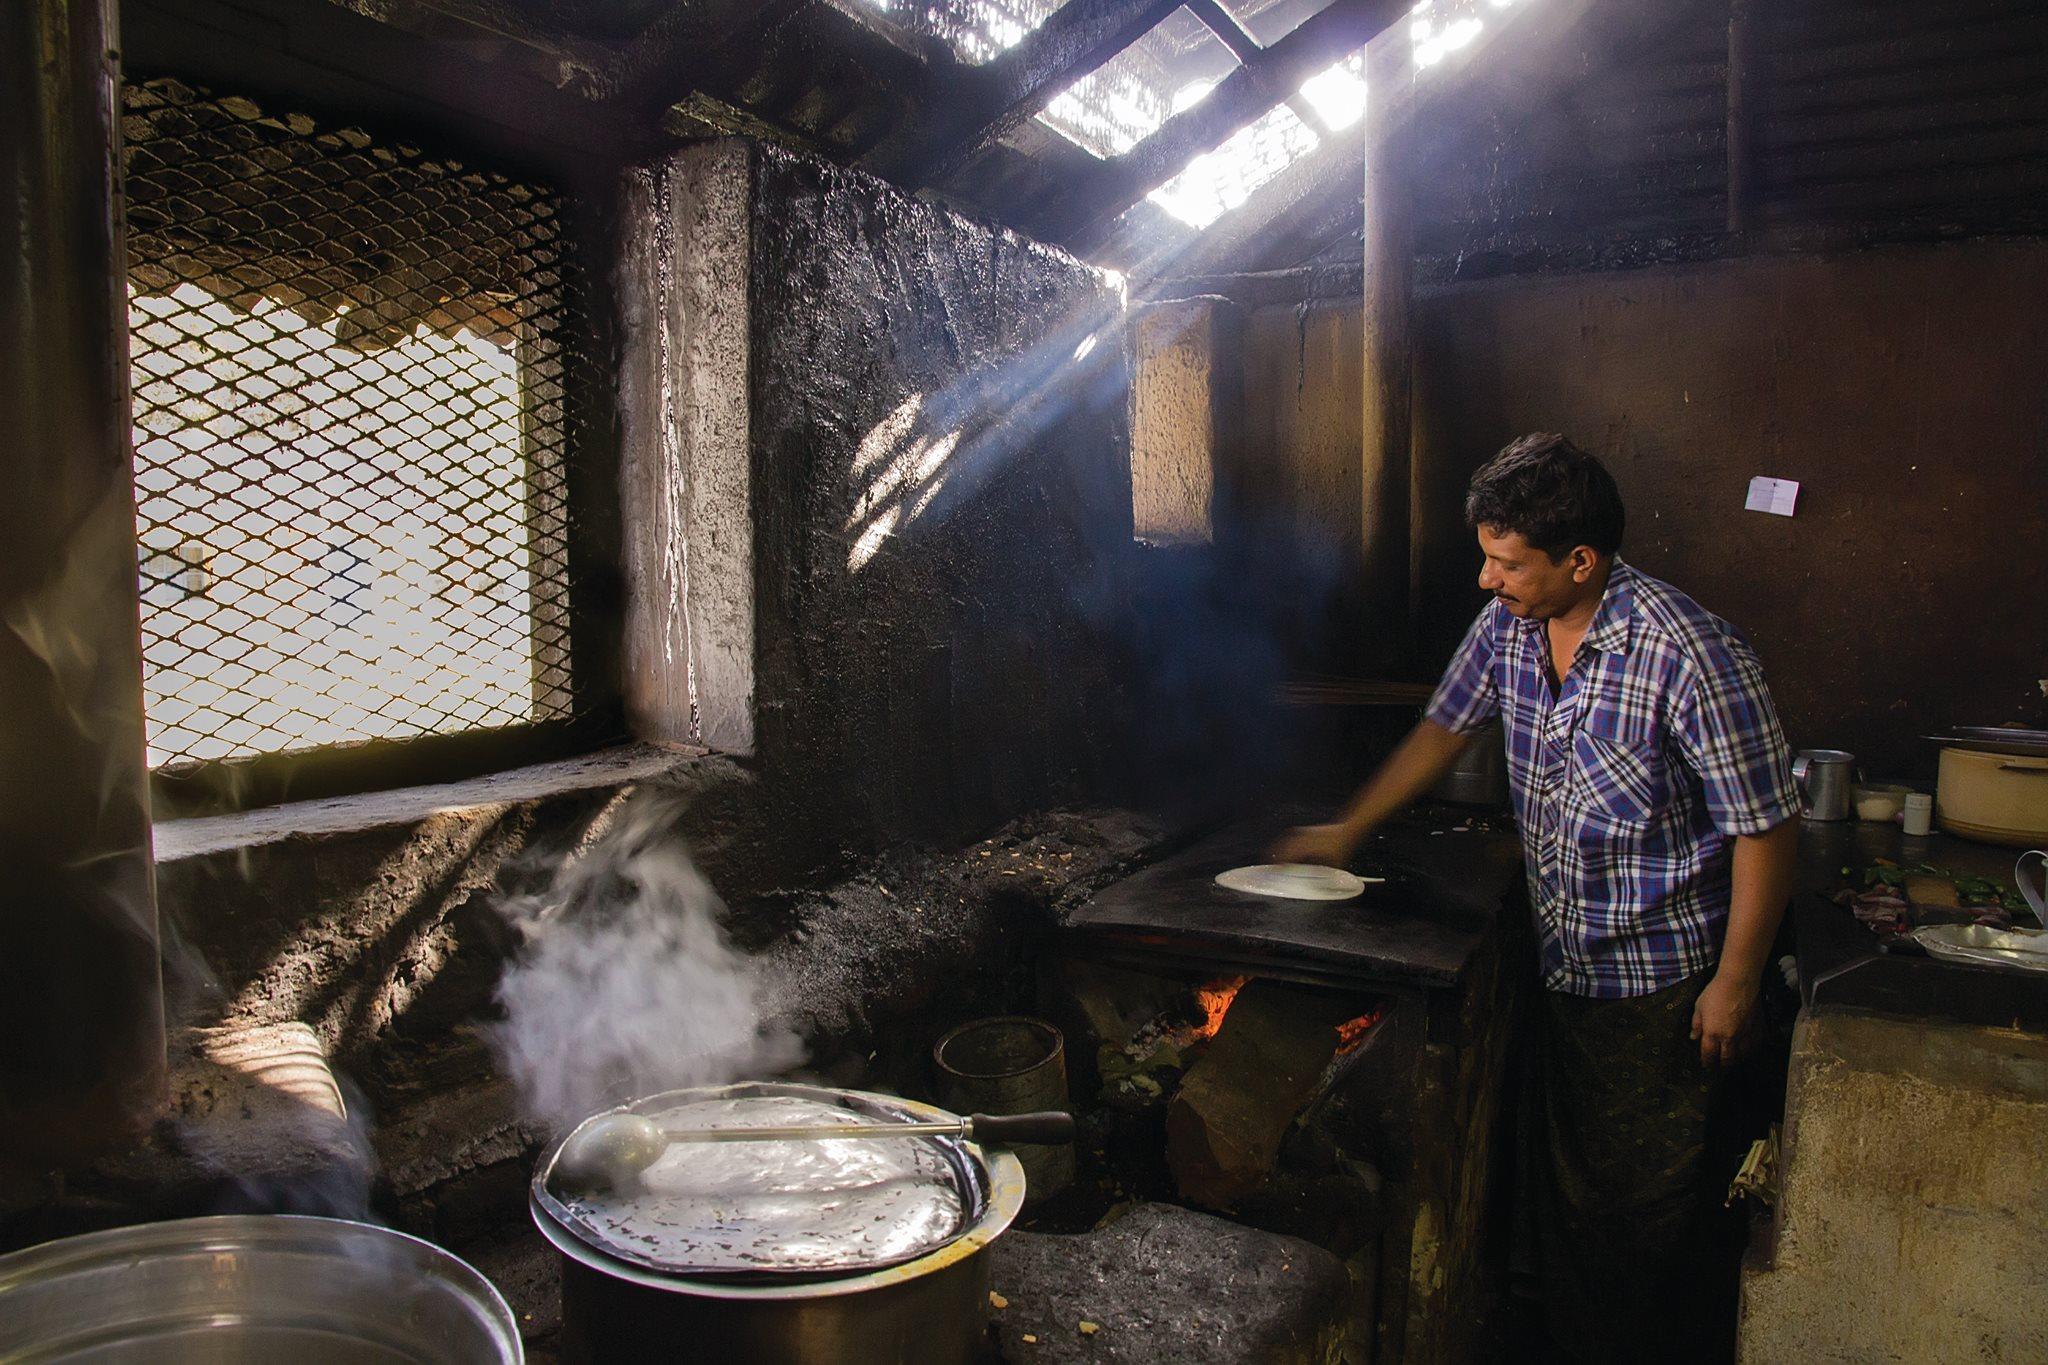 attakatty, restaurants in valparai, local treats, places to eat in Pollachi, places to eat in pollachi, local food joint, best vegetarian restaurant, local joints to eat, explore pollachi,